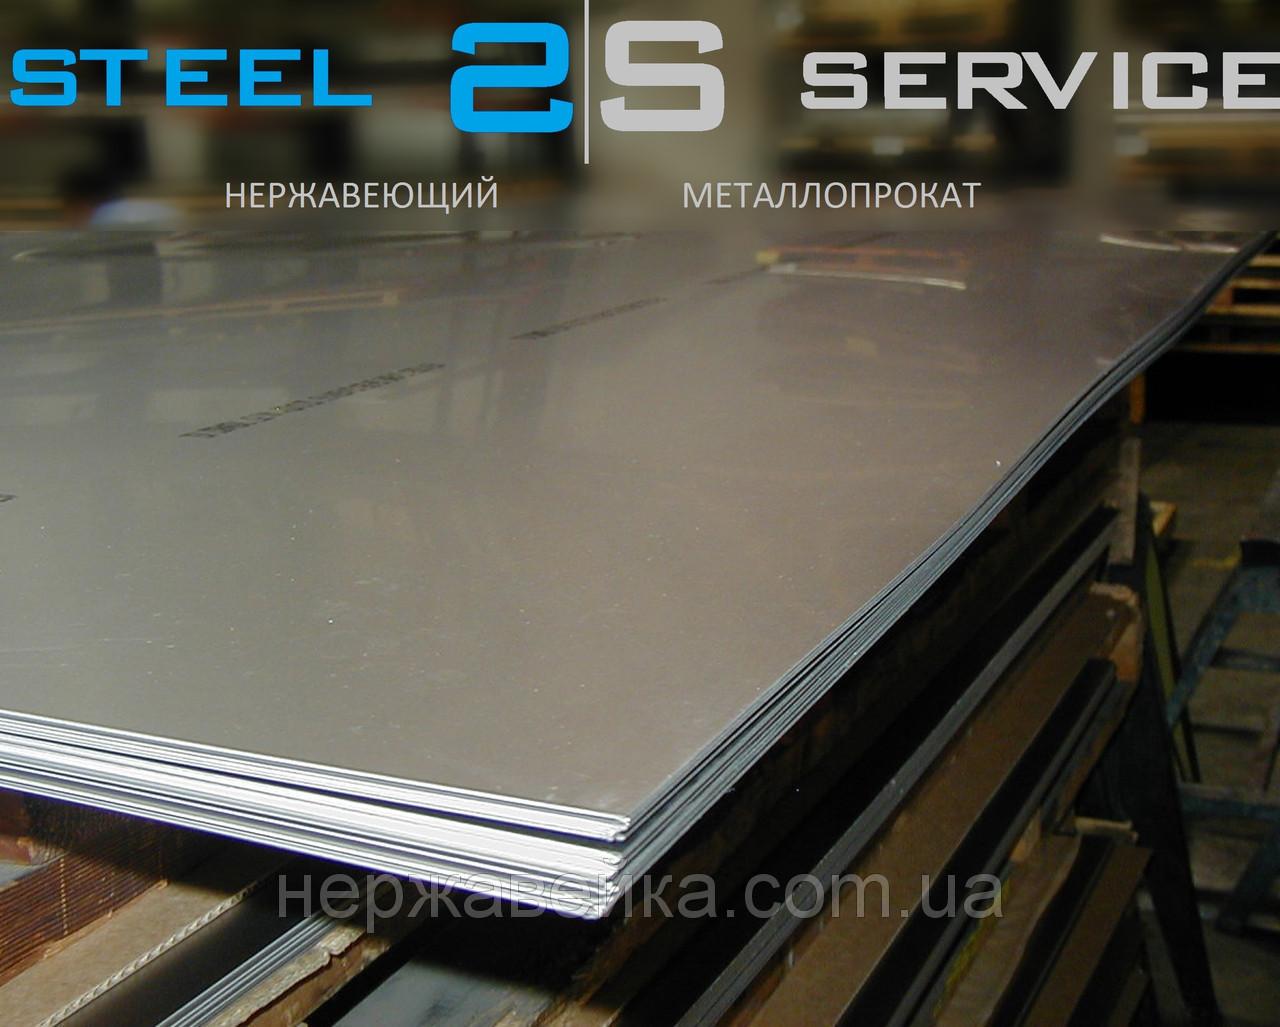 Нержавеющий лист 6х1250х2500мм AISI 430(12Х17) 2B - матовый, технический